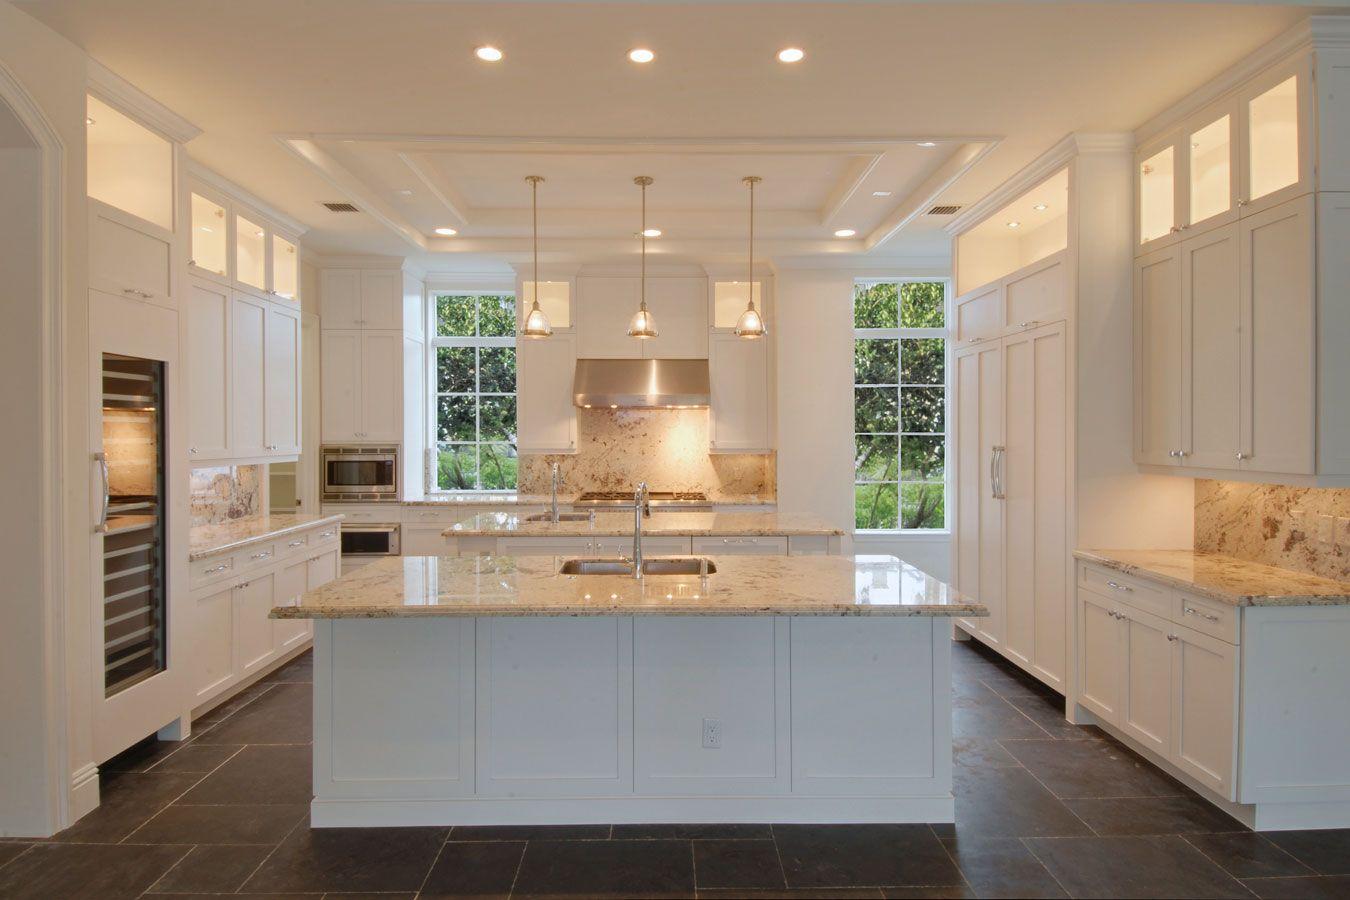 Srd Builders Out Of Boca Raton Fl In 2020 Kitchen Design Cool Kitchens Kitchen